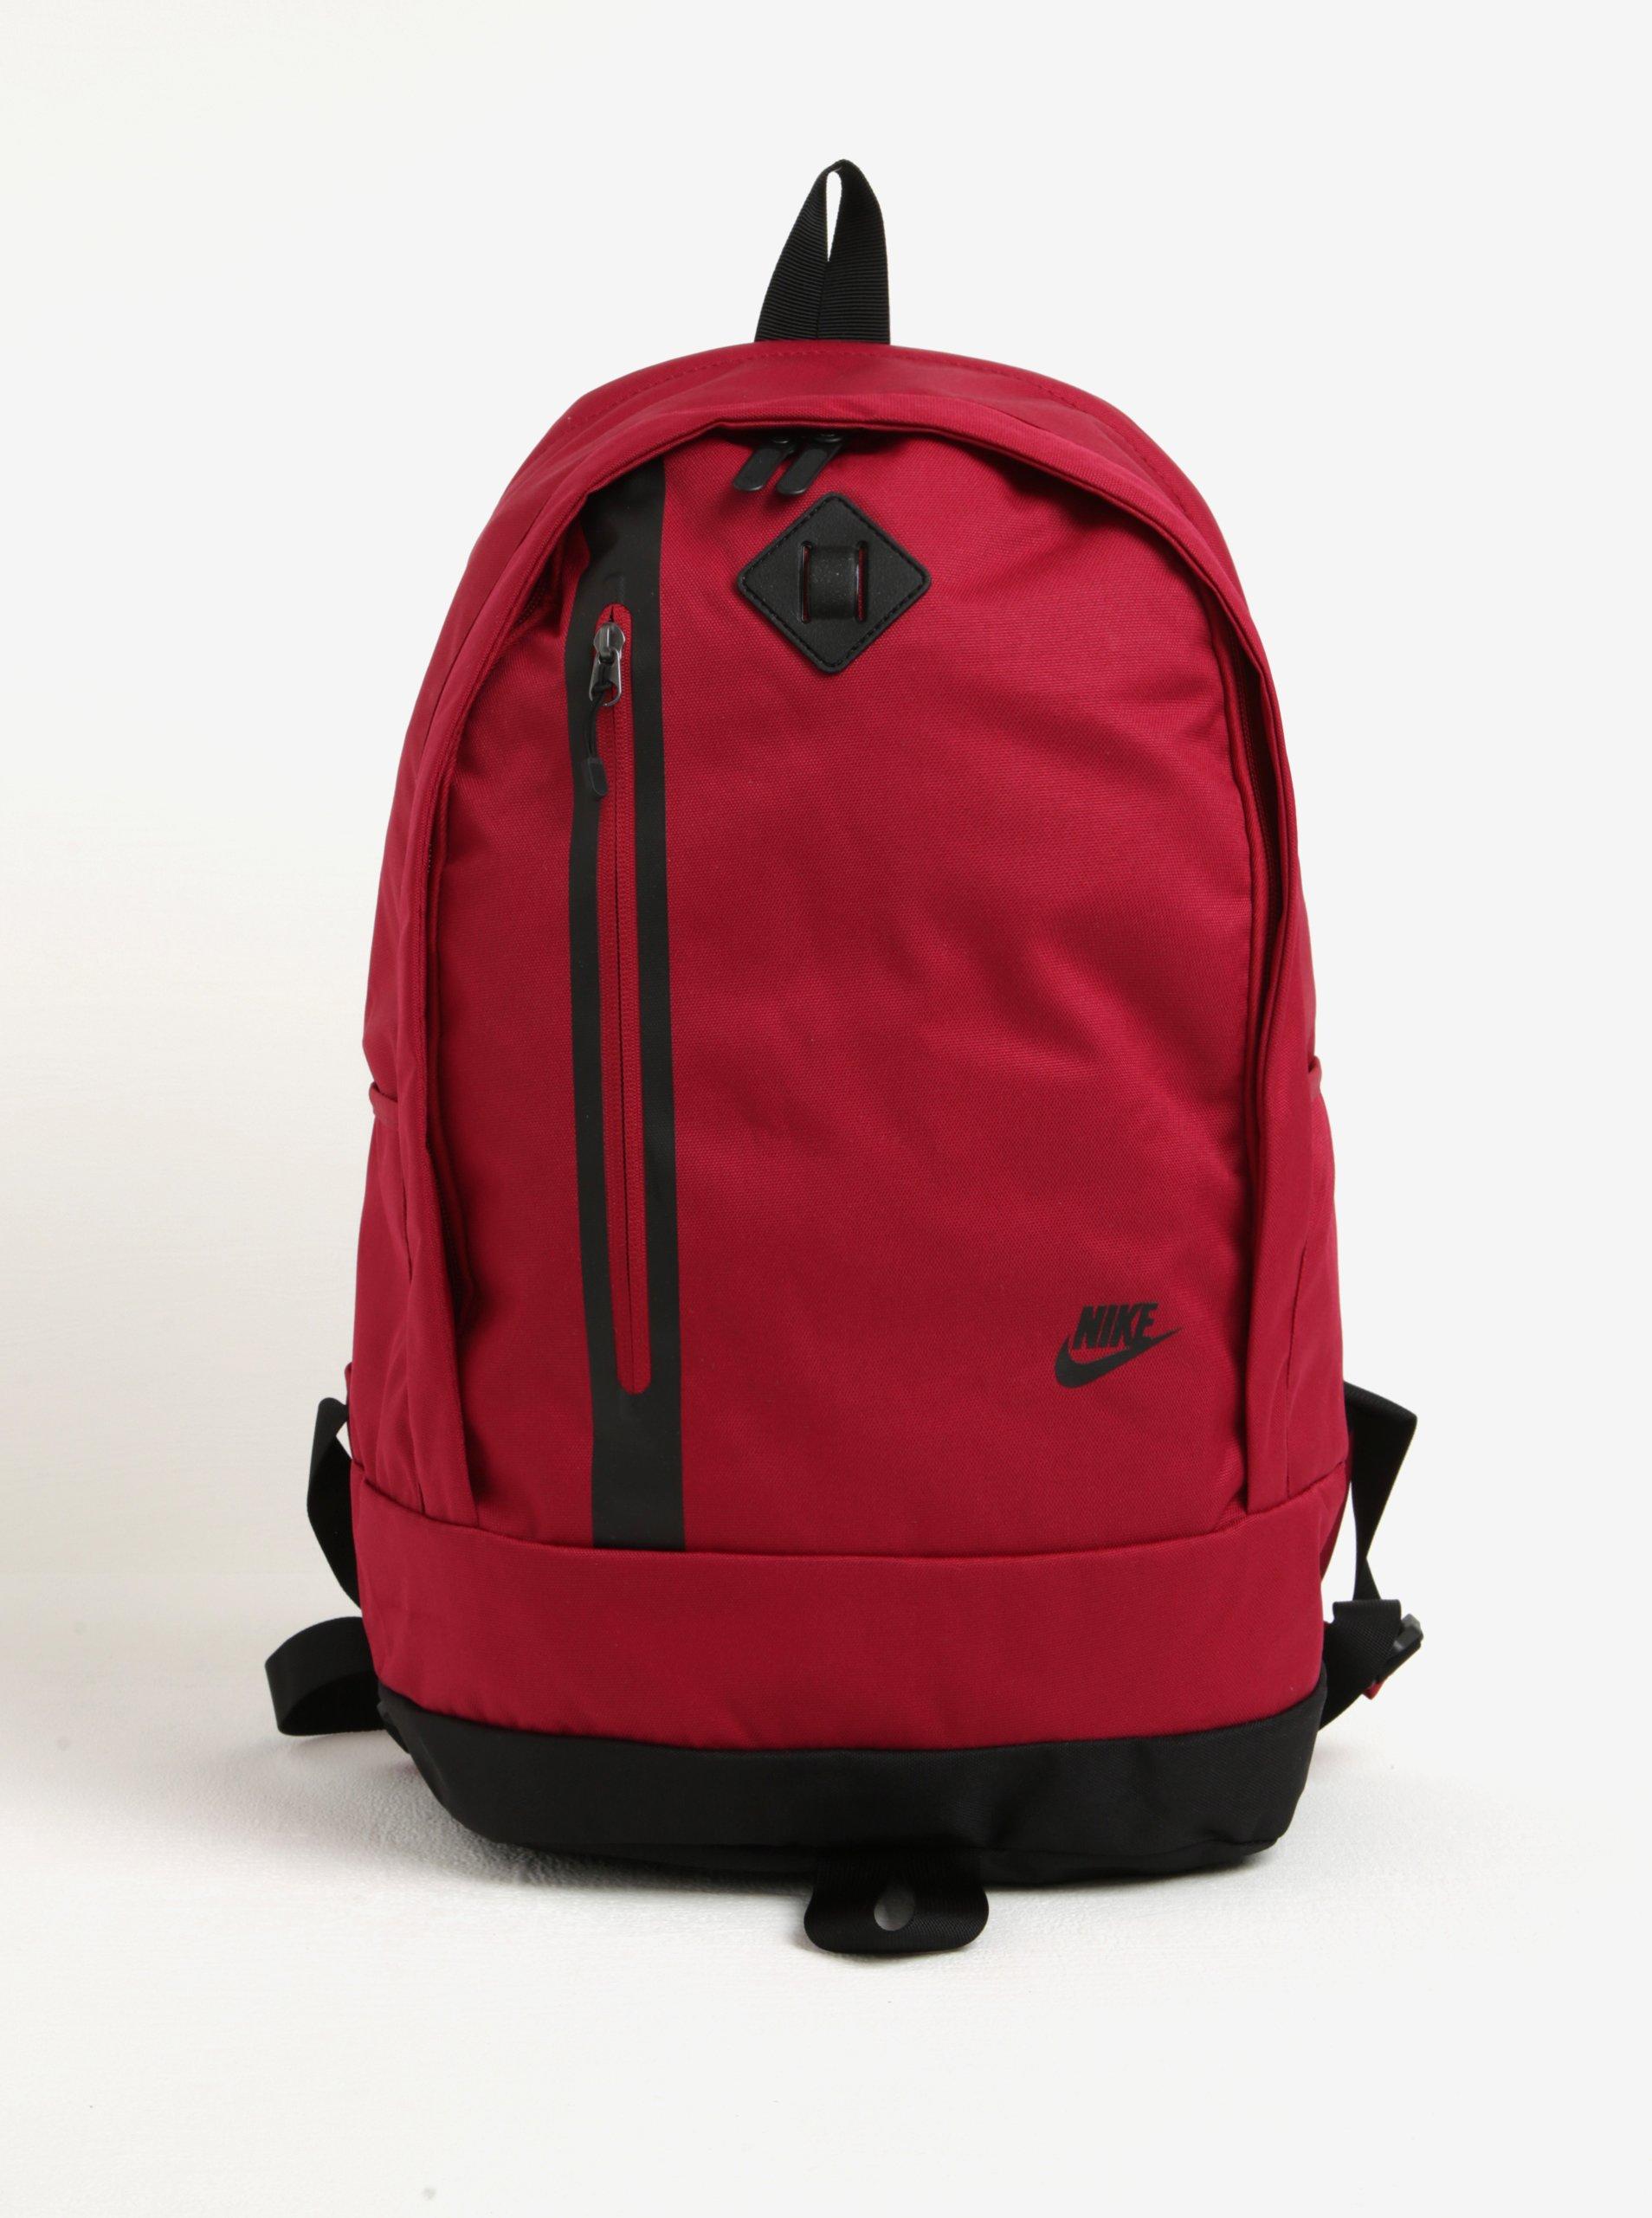 Červený batoh Nike Cheyenne 27 l